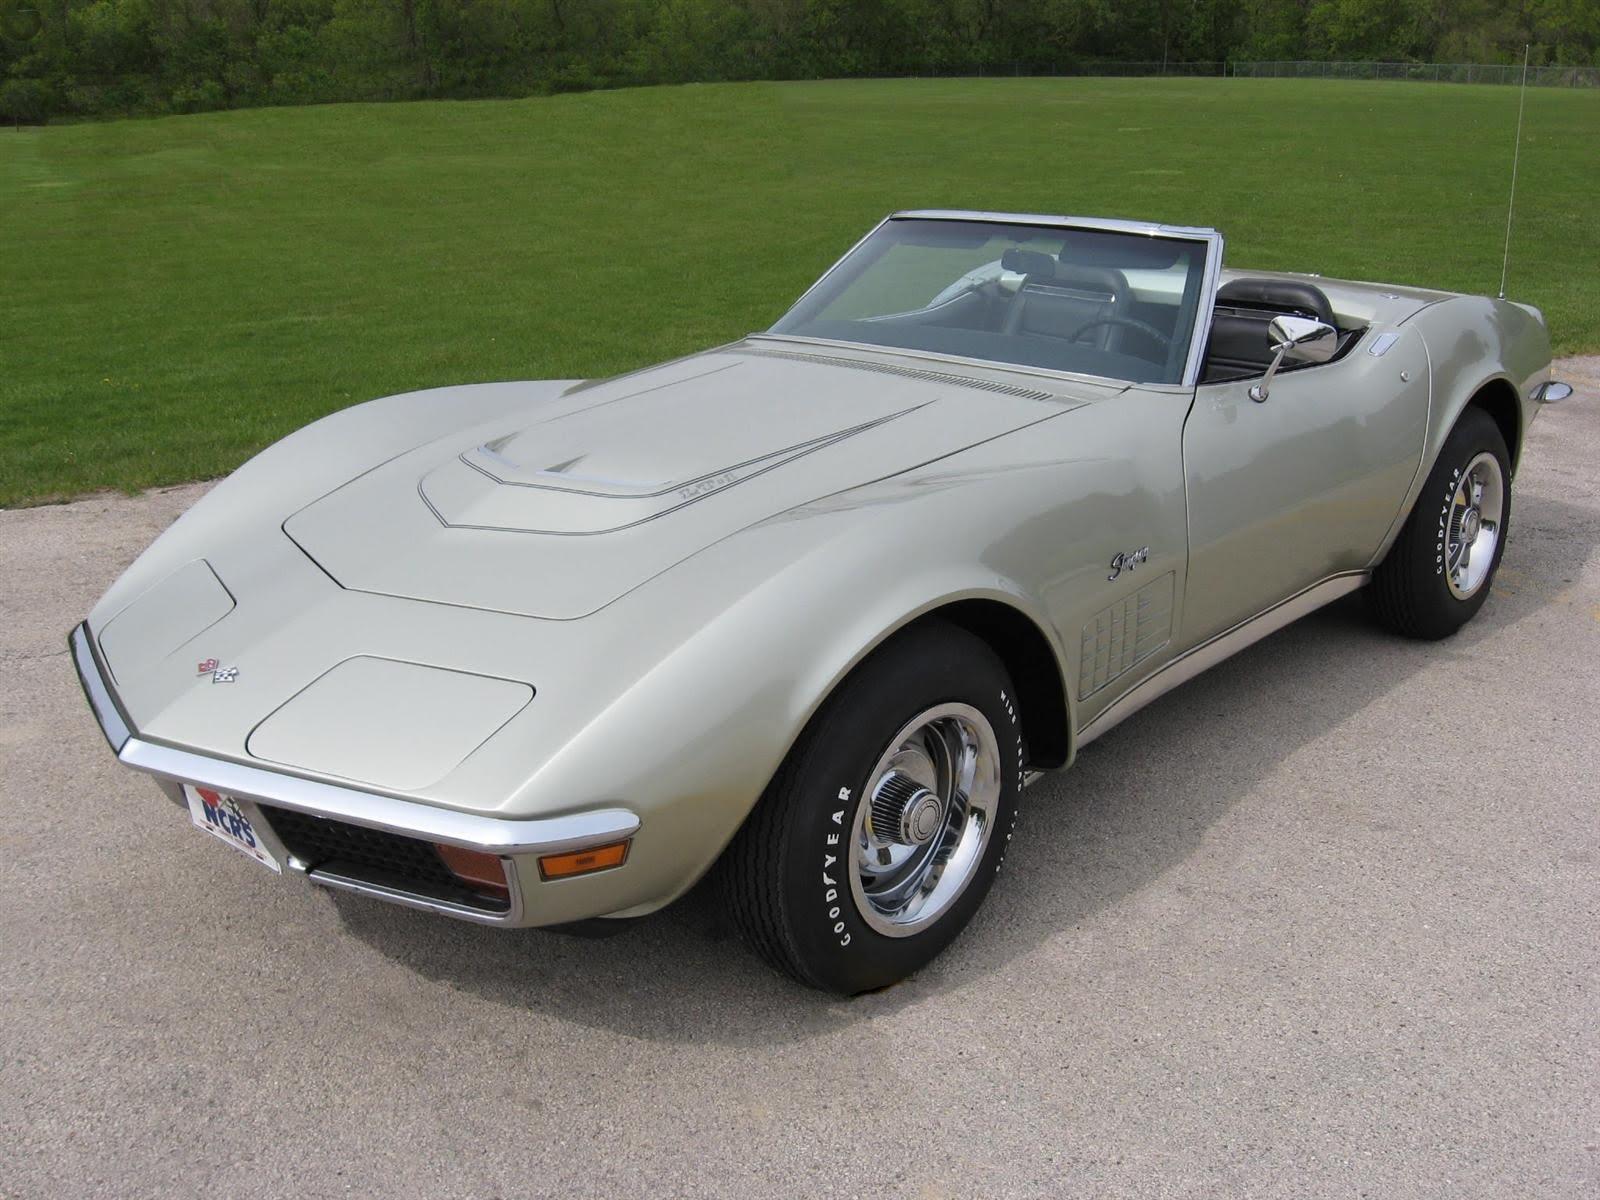 muscle car classics rare 1972 chevrolet corvette lt1 factory a c convertible. Black Bedroom Furniture Sets. Home Design Ideas